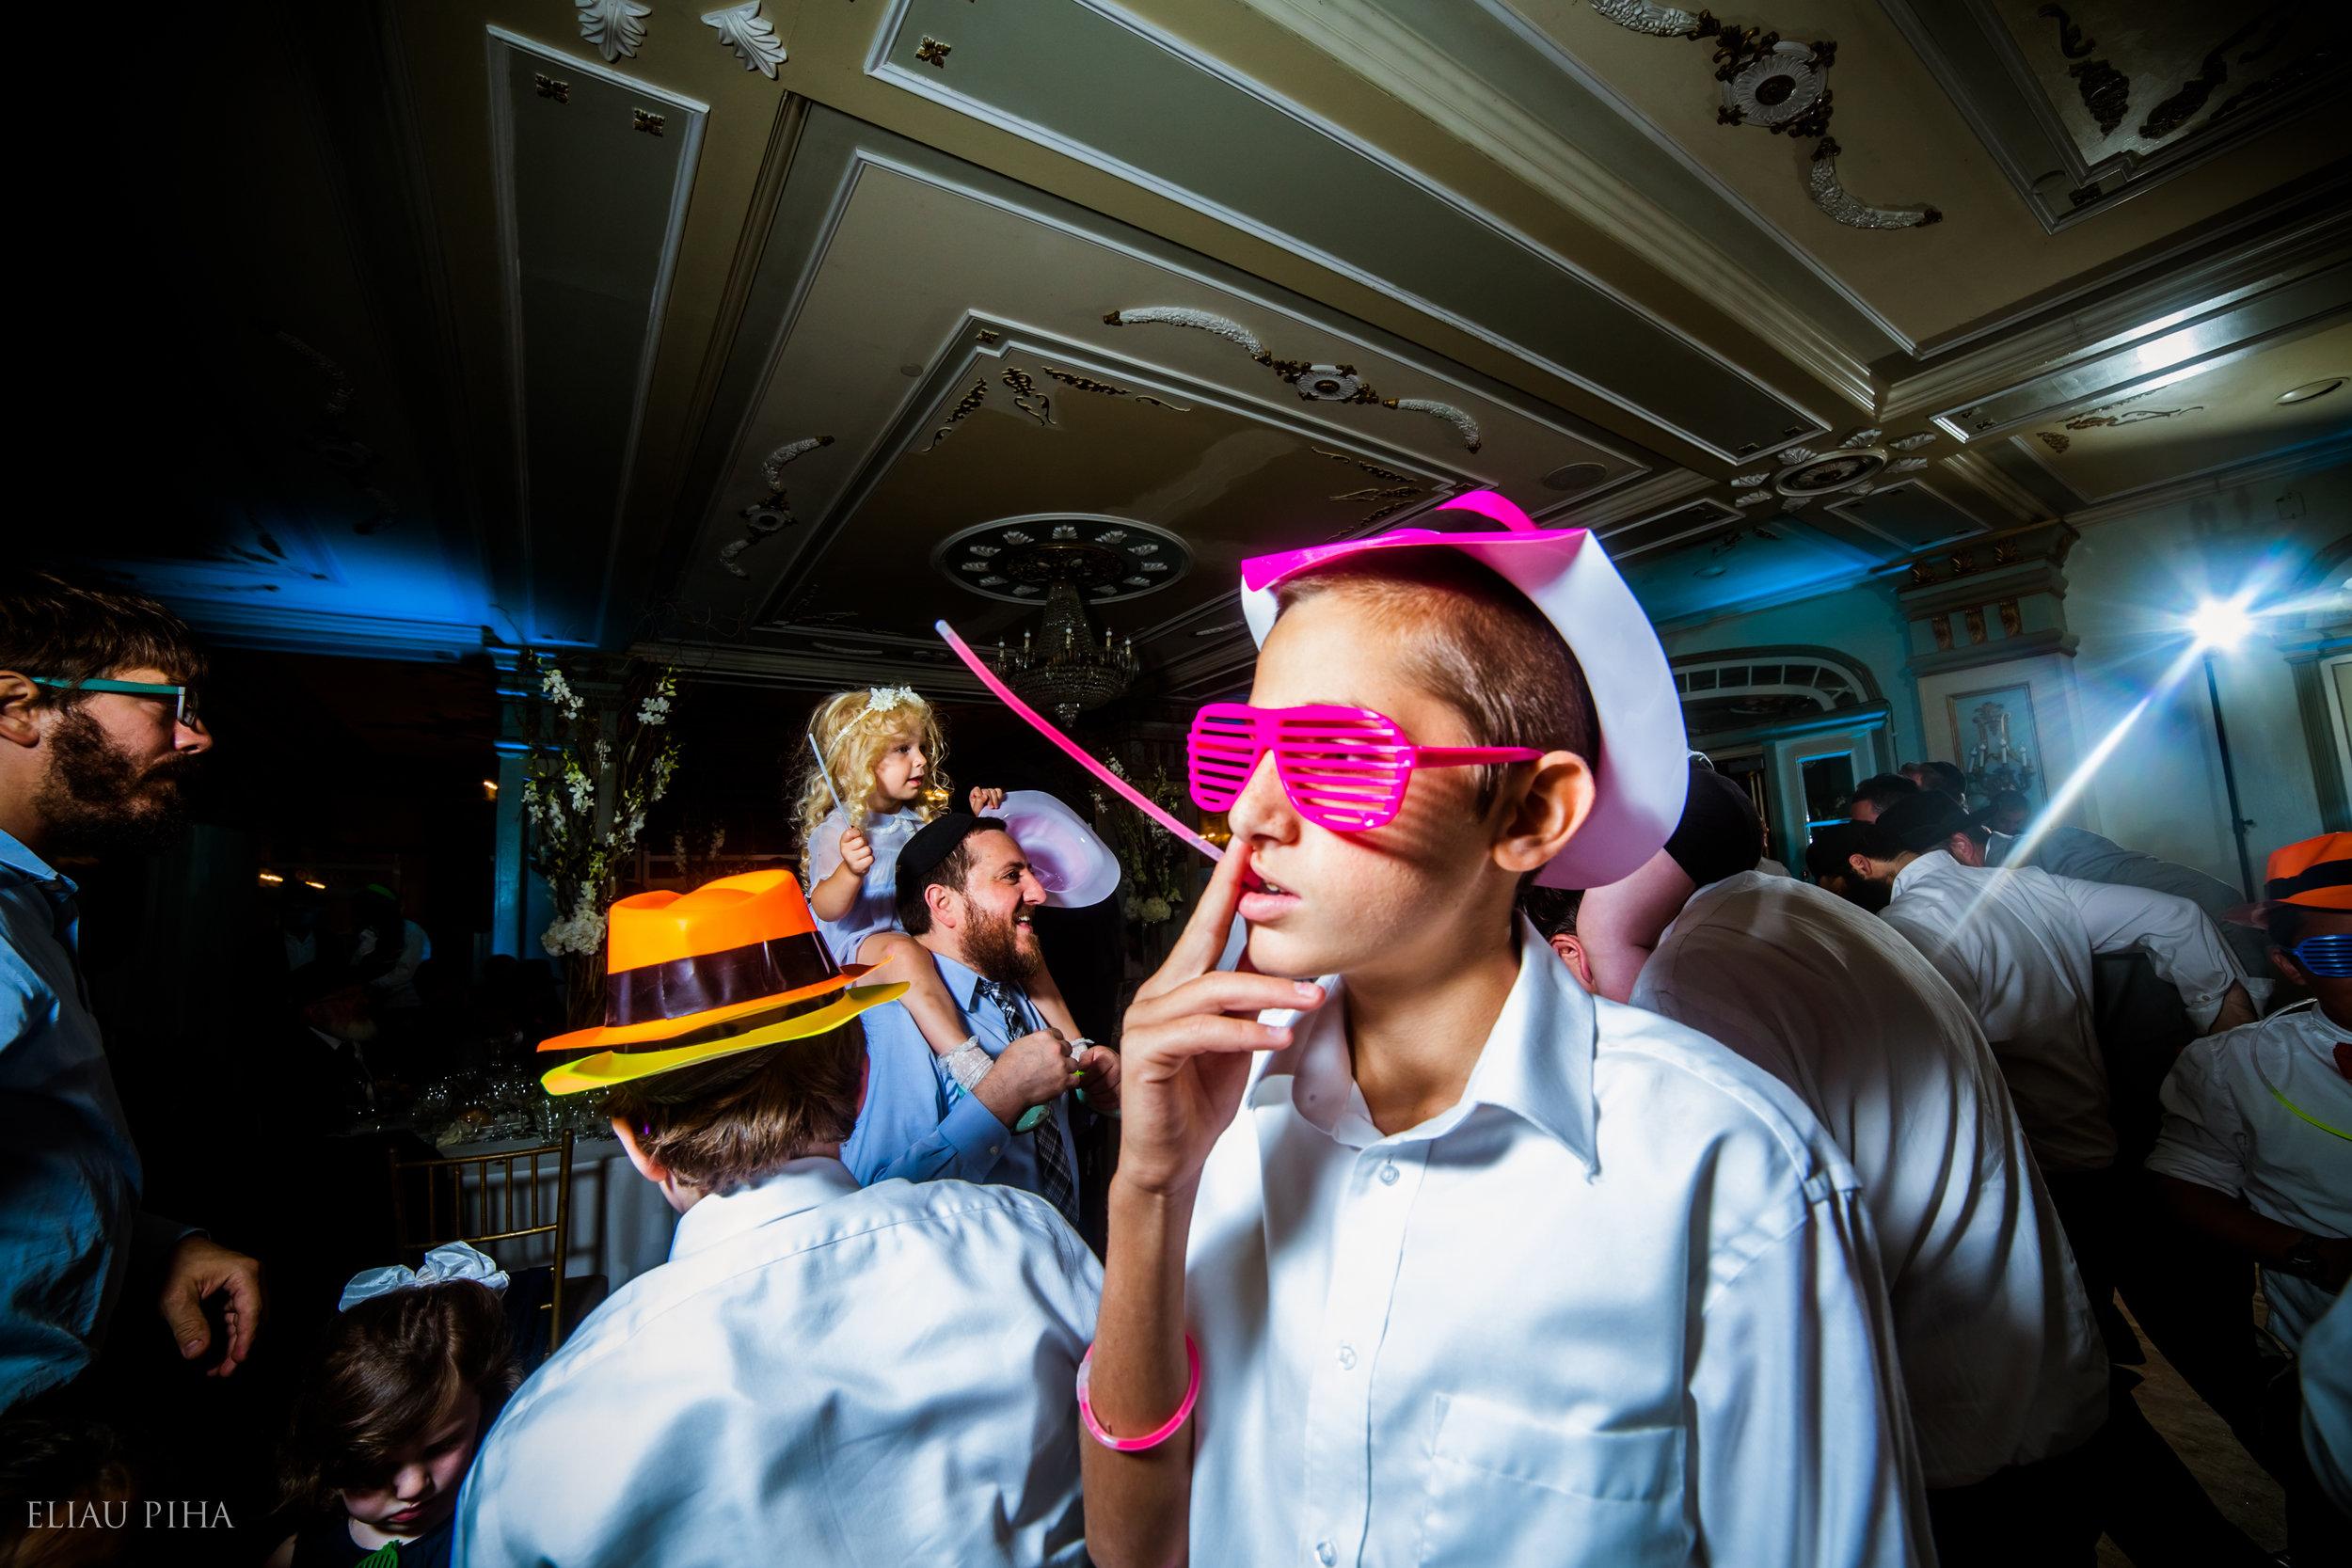 Bar Mitzvah Meir Sandman - photography, new york, events, people -0482.jpg